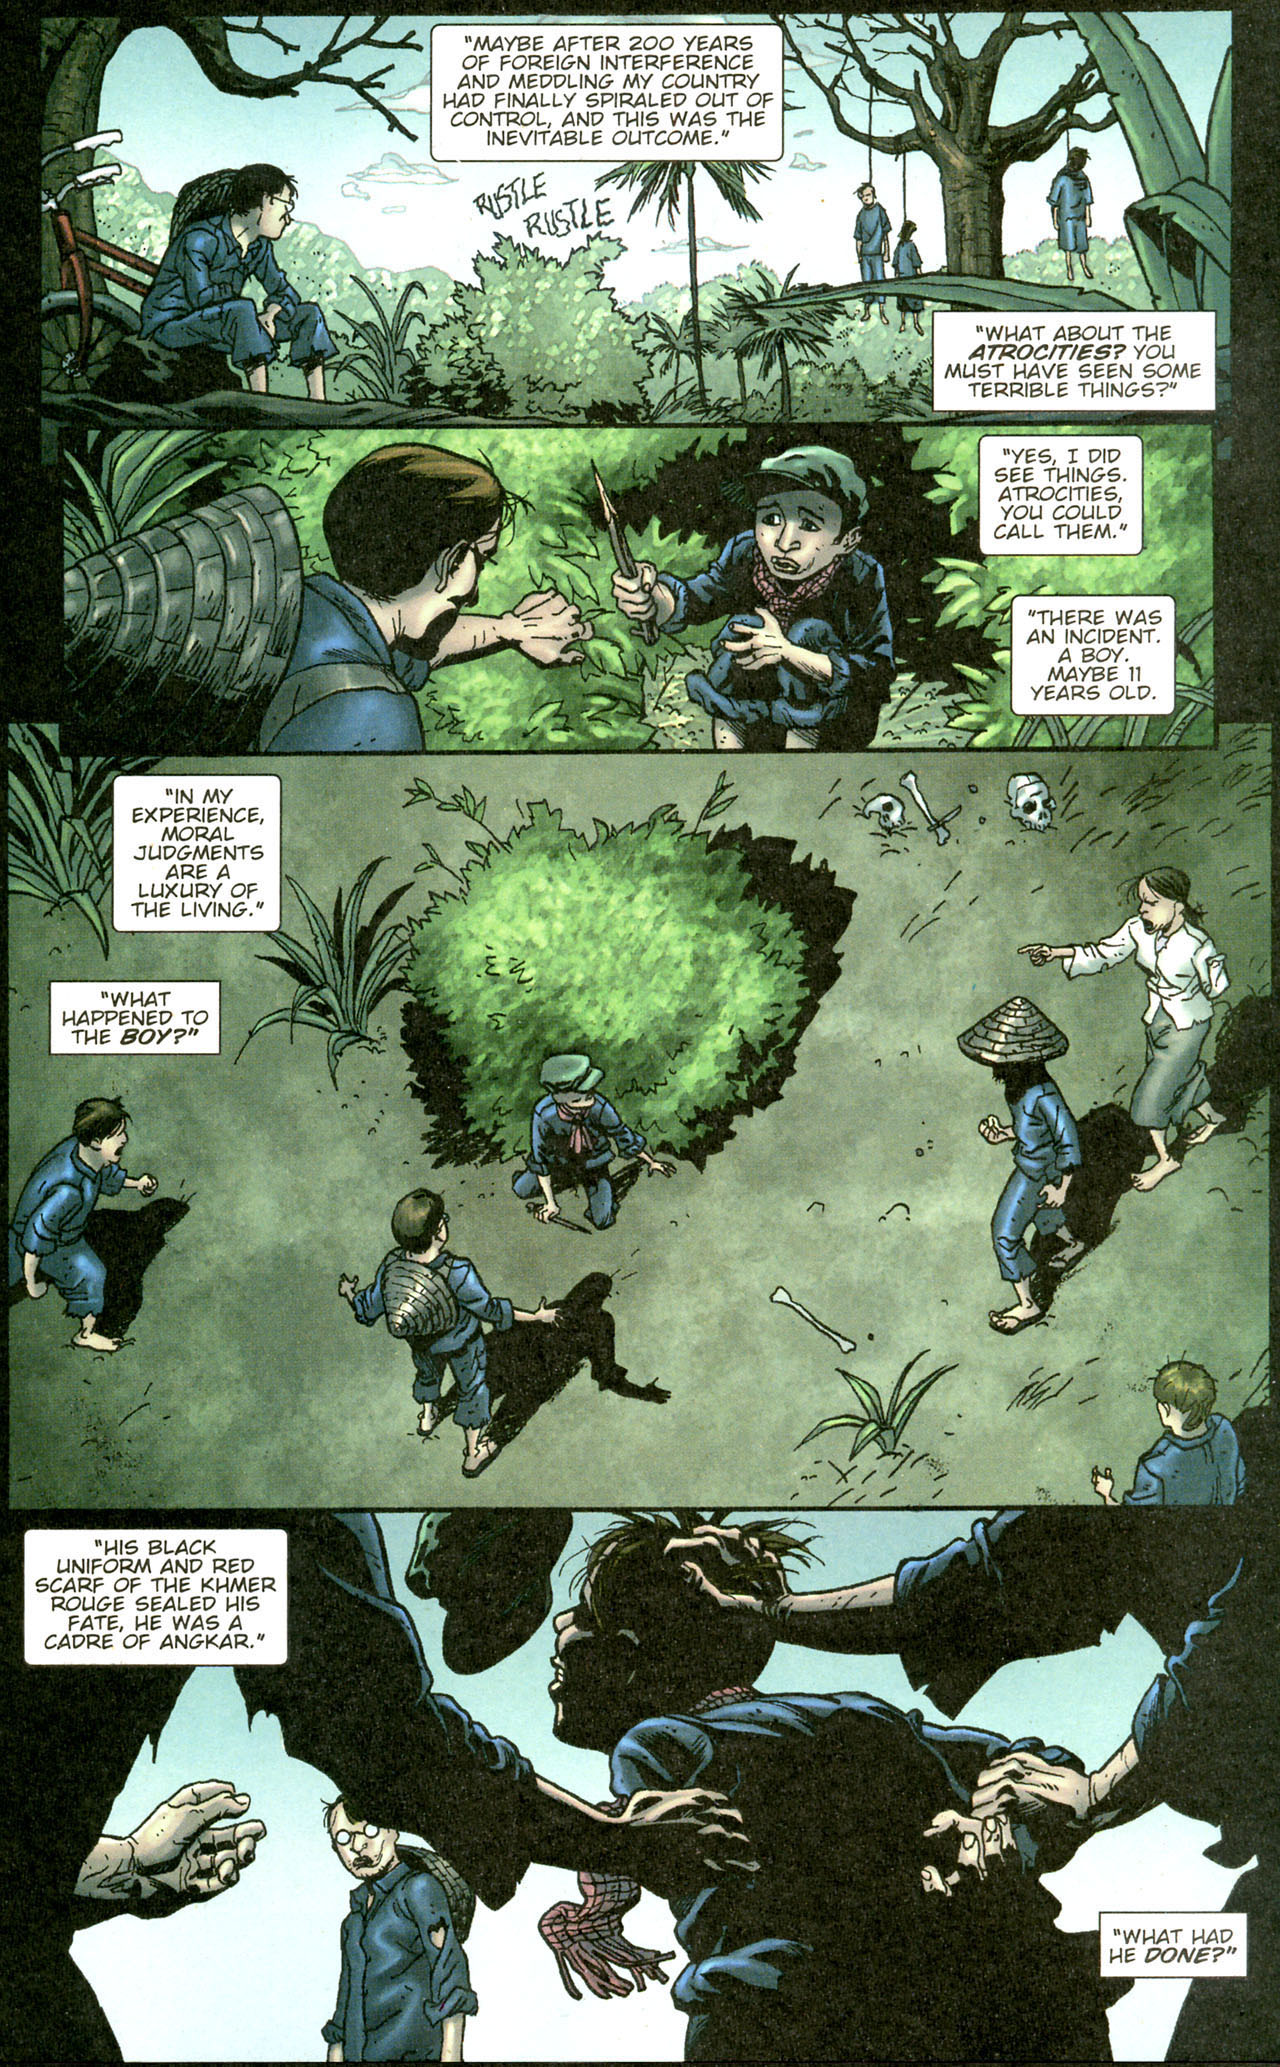 Read online The Exterminators comic -  Issue #11 - 16